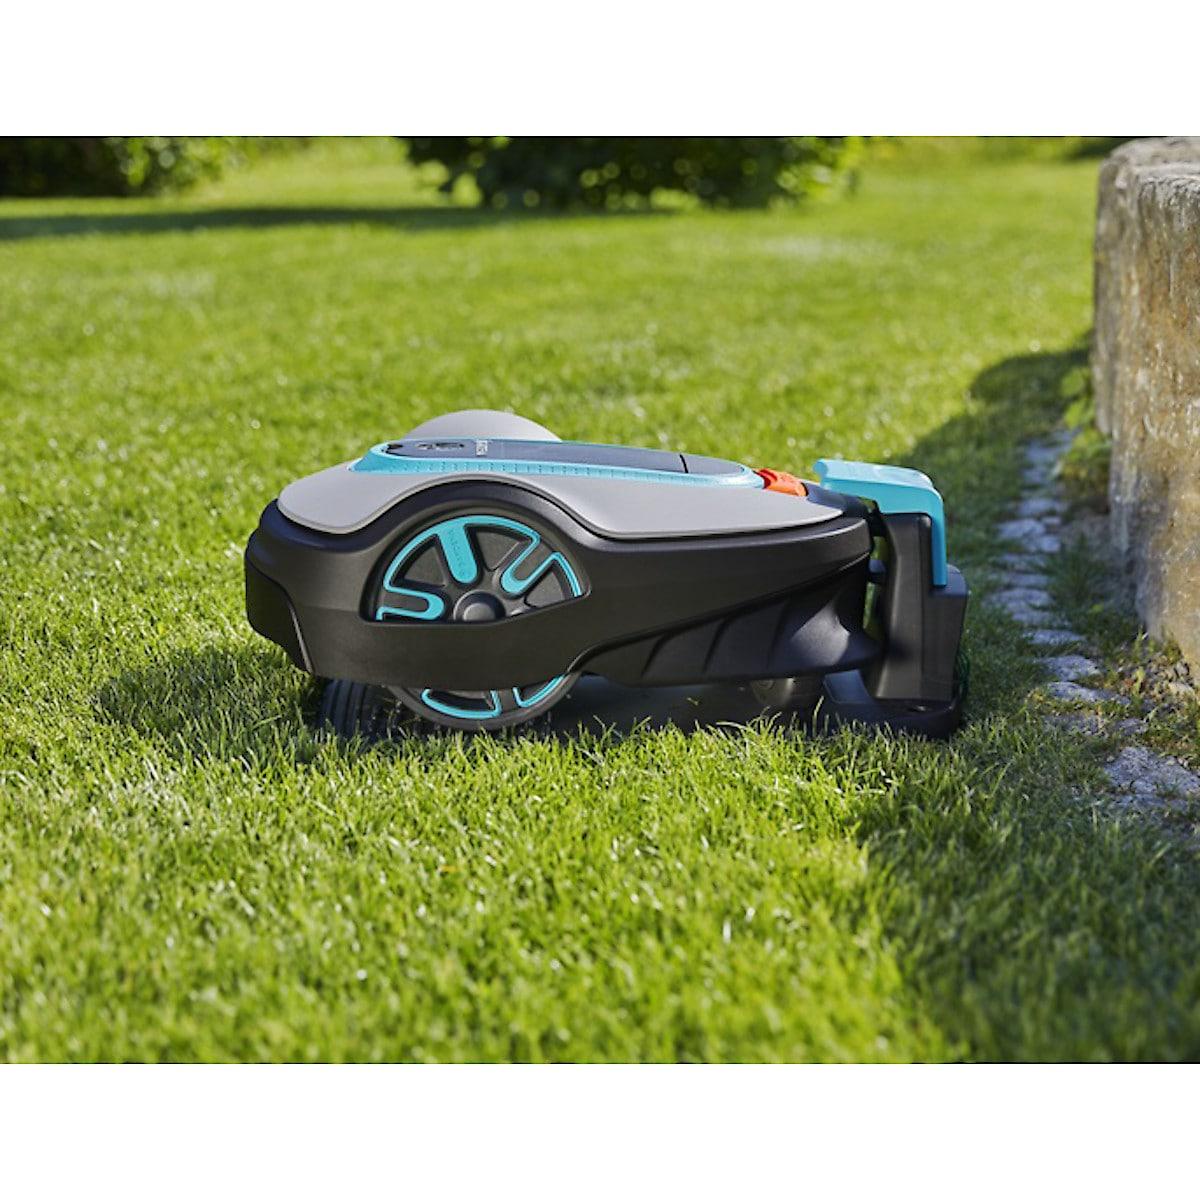 Gardena Smart Sileno Life 1000, robotgressklipper